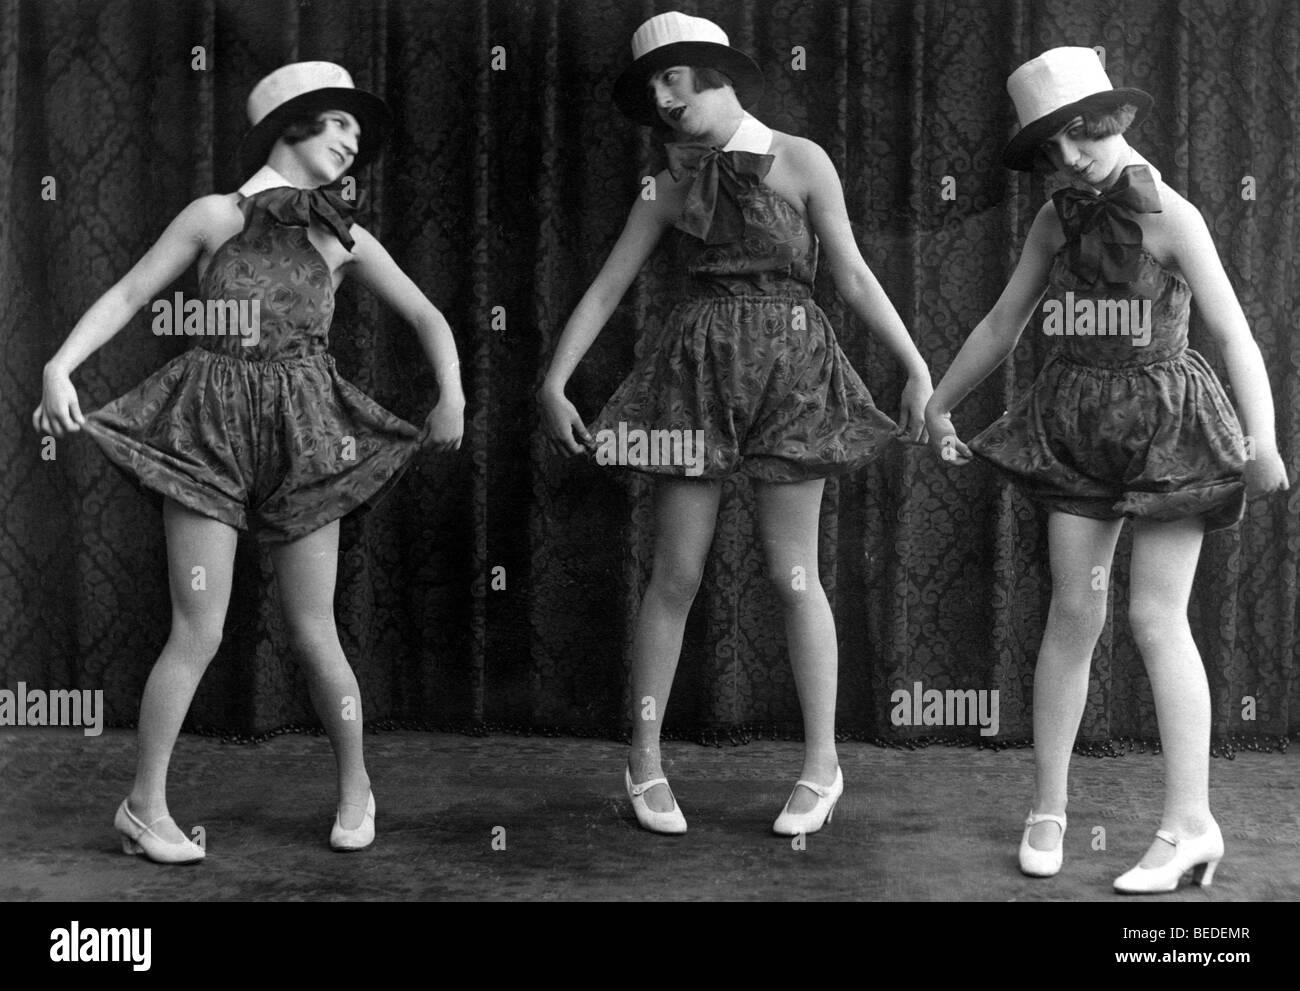 Historic photograph, three women doing the twist, around 1925 - Stock Image